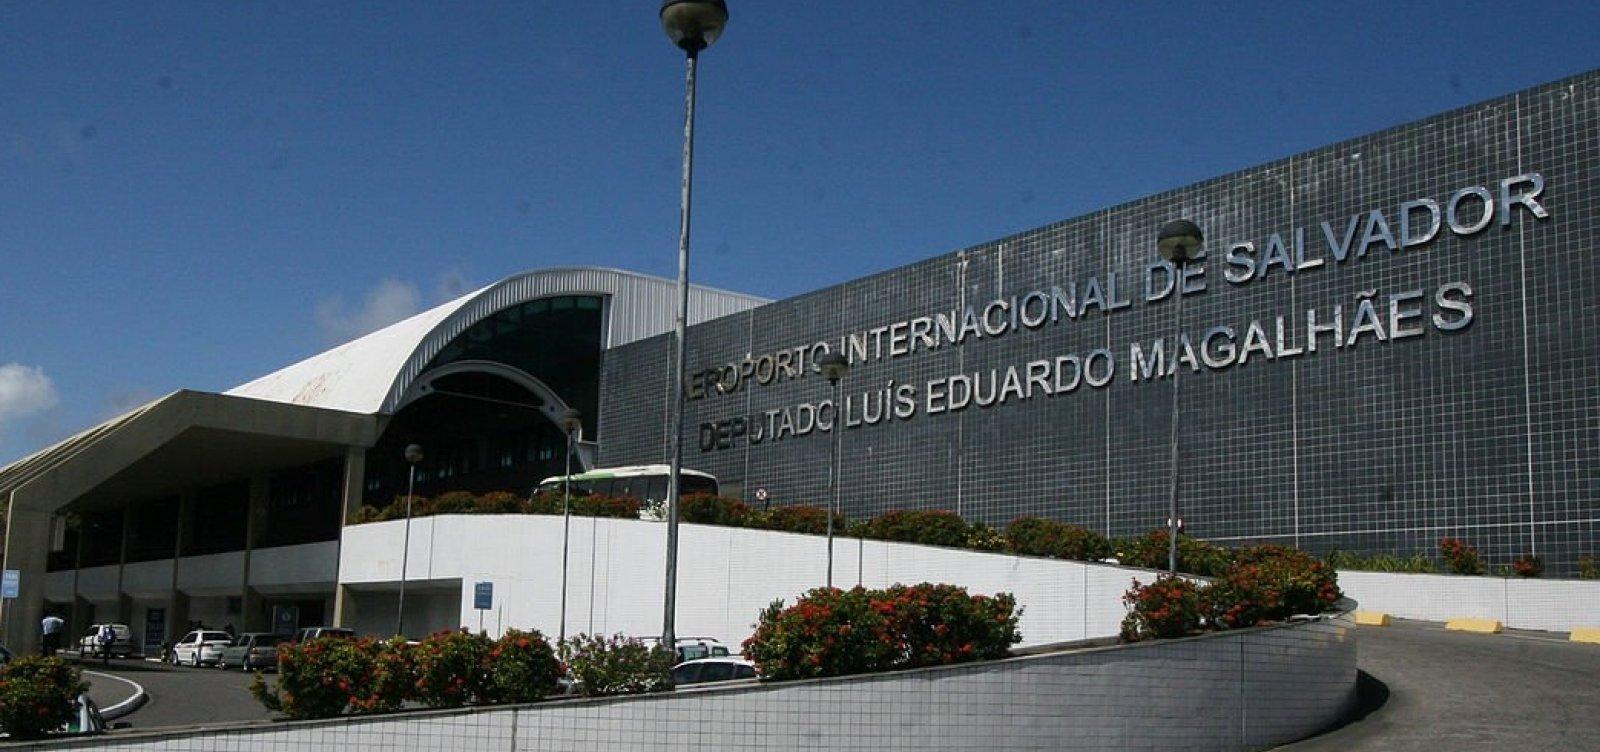 [Mau tempo altera rotina no Aeroporto de Salvador]